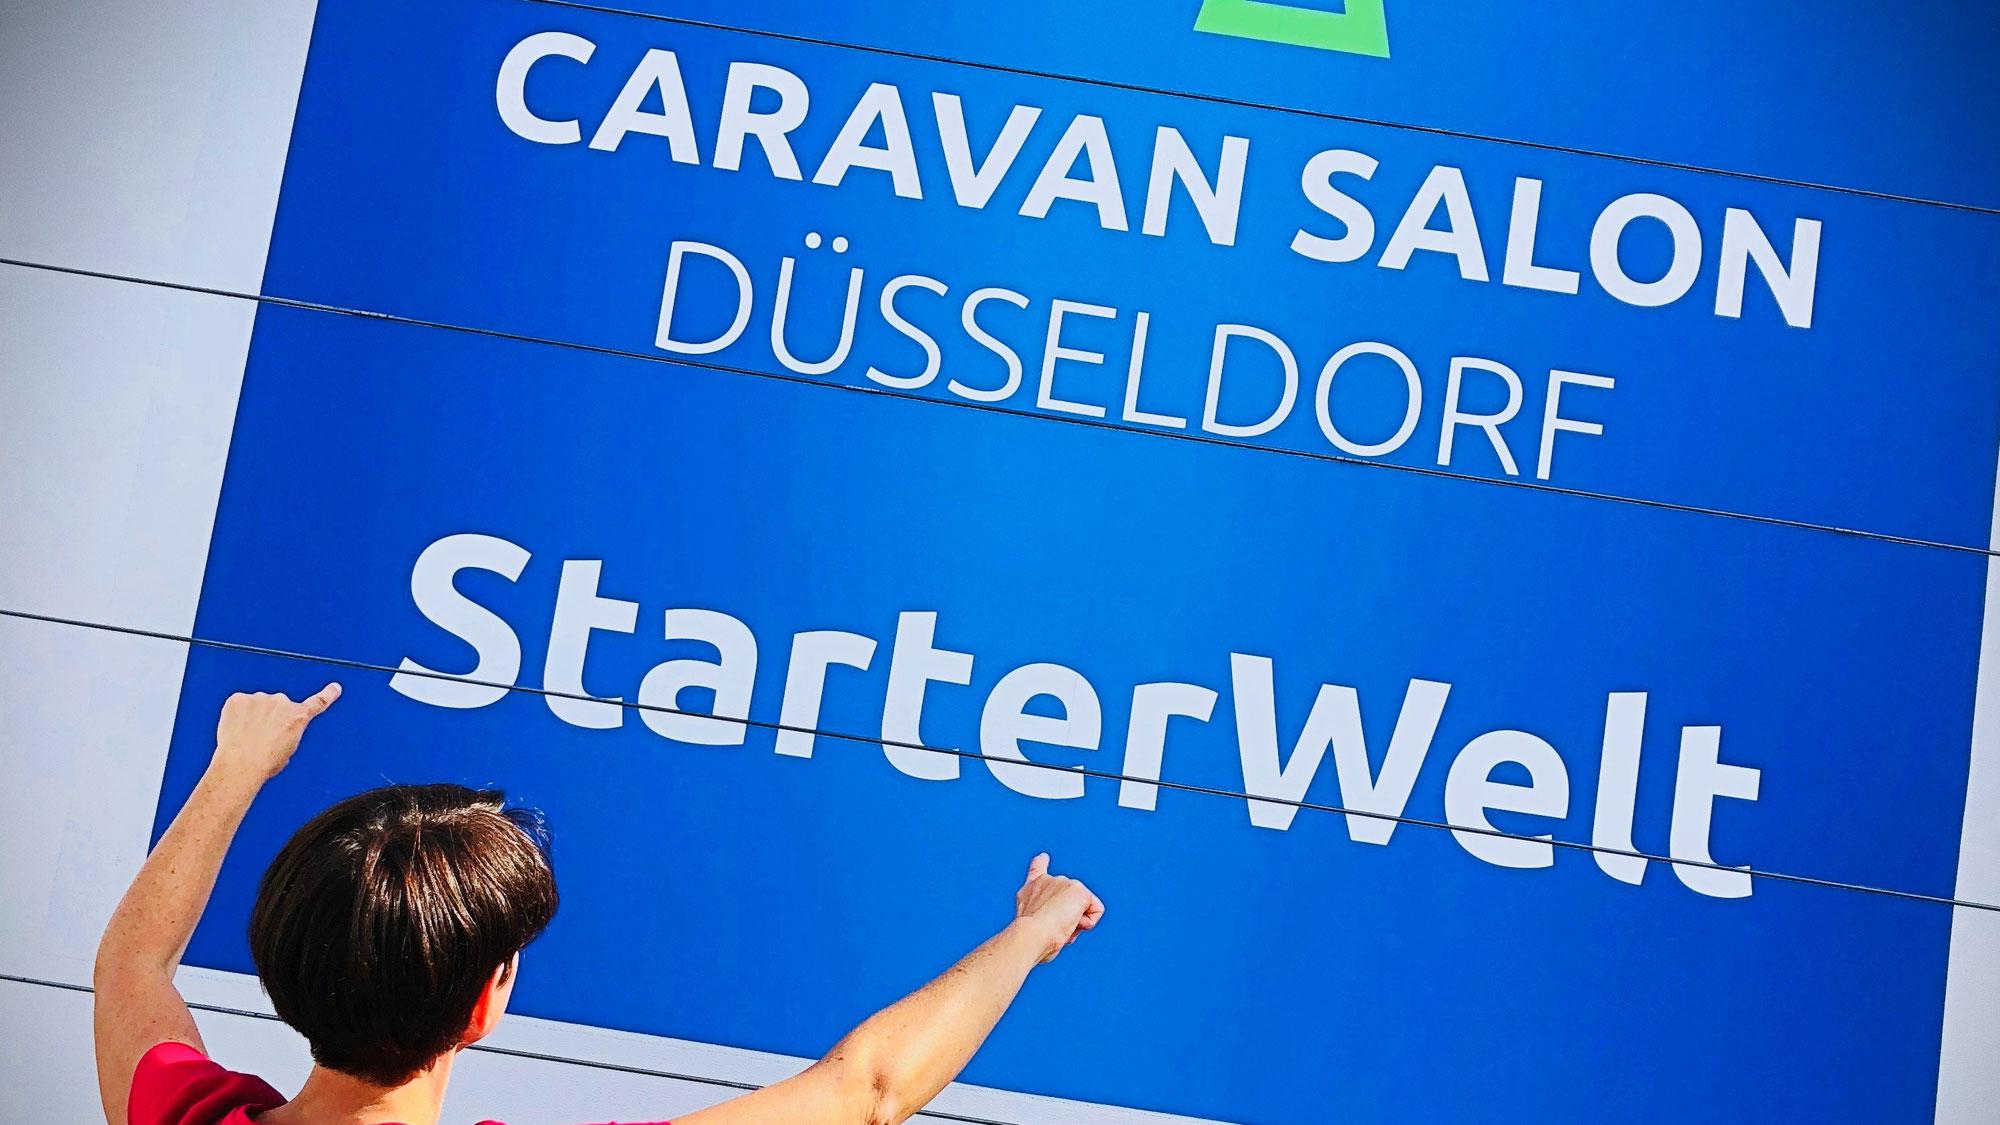 Caravan Salon Düsseldorf 2018 (Teil 1)...